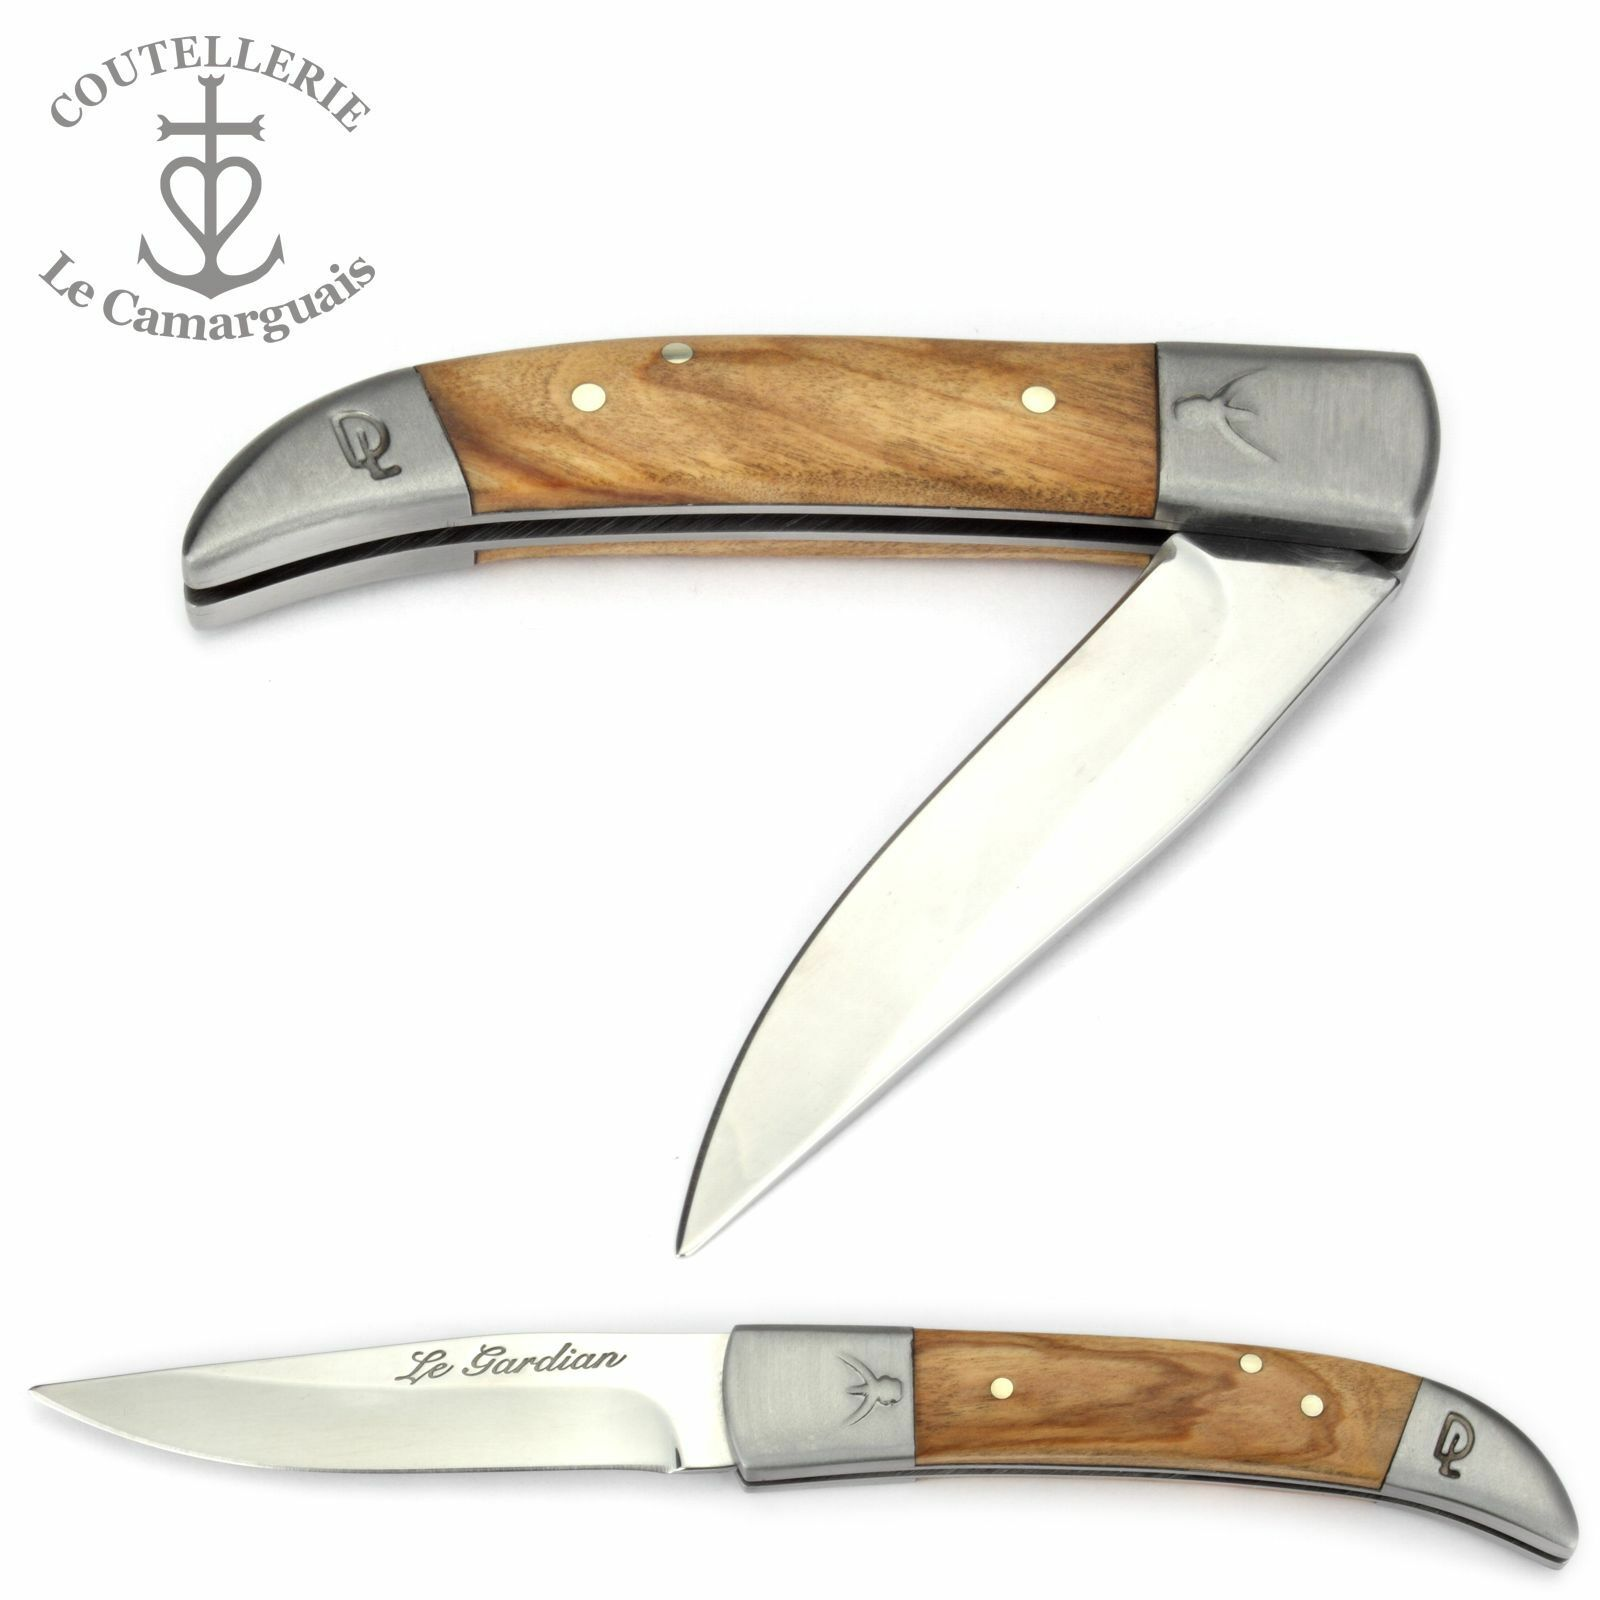 Camargu Taschenmesser Le Gardian 10 cm cm cm - Olivenholz - Messer Frankreich Camargue 1fa332